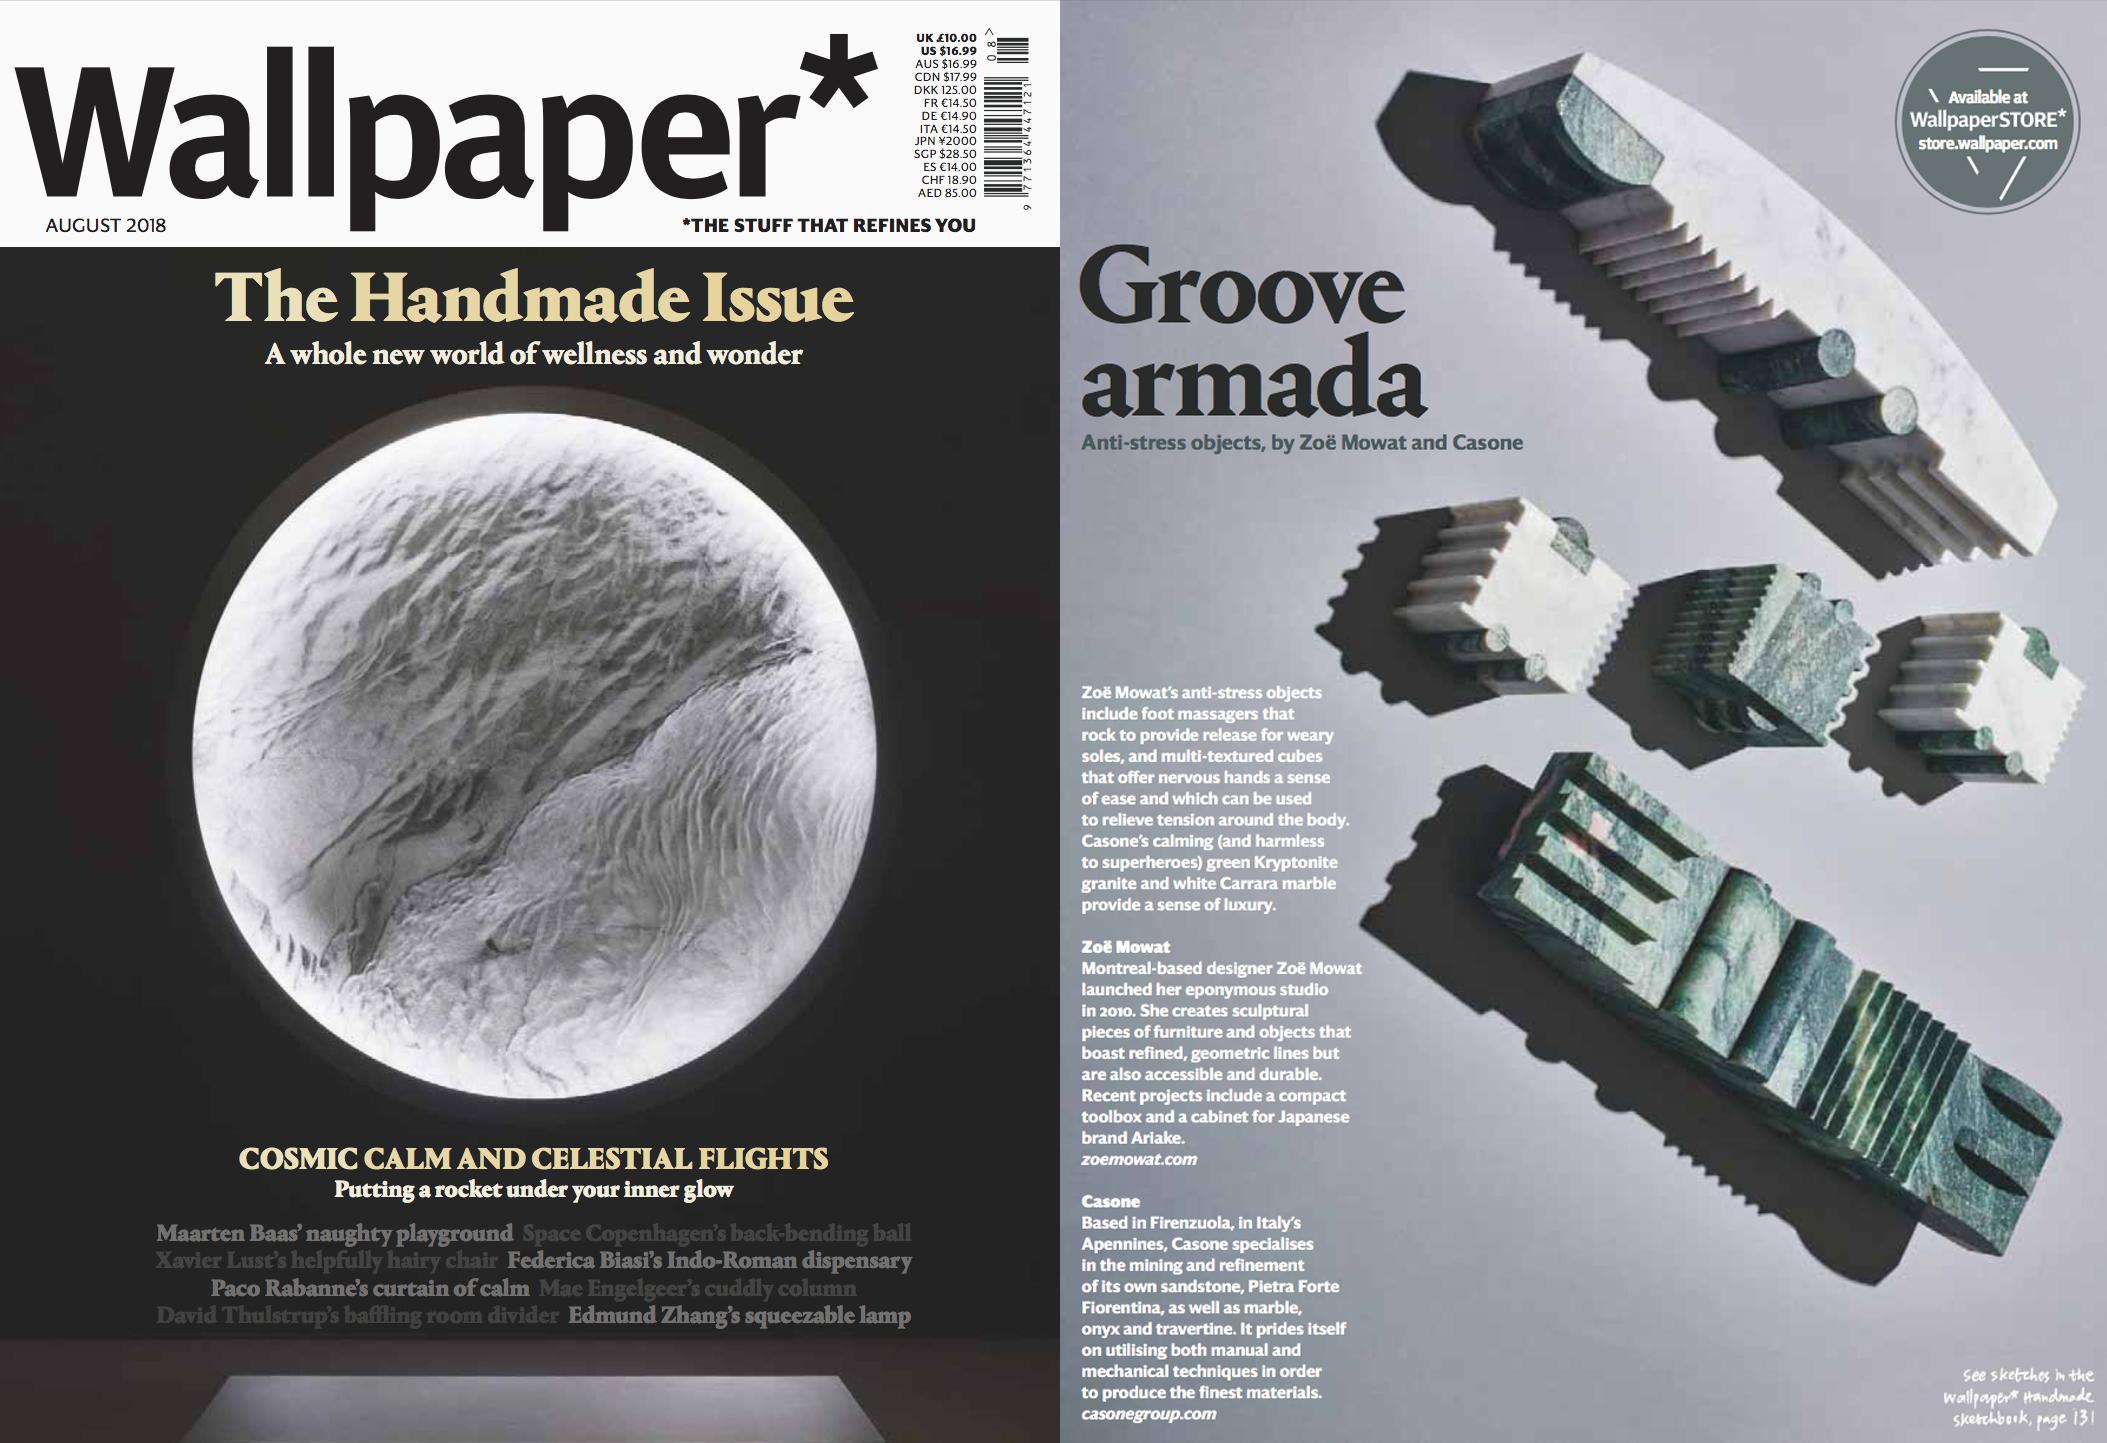 WALLPAPER HANDMADE ISSUE, AUGUST 2018